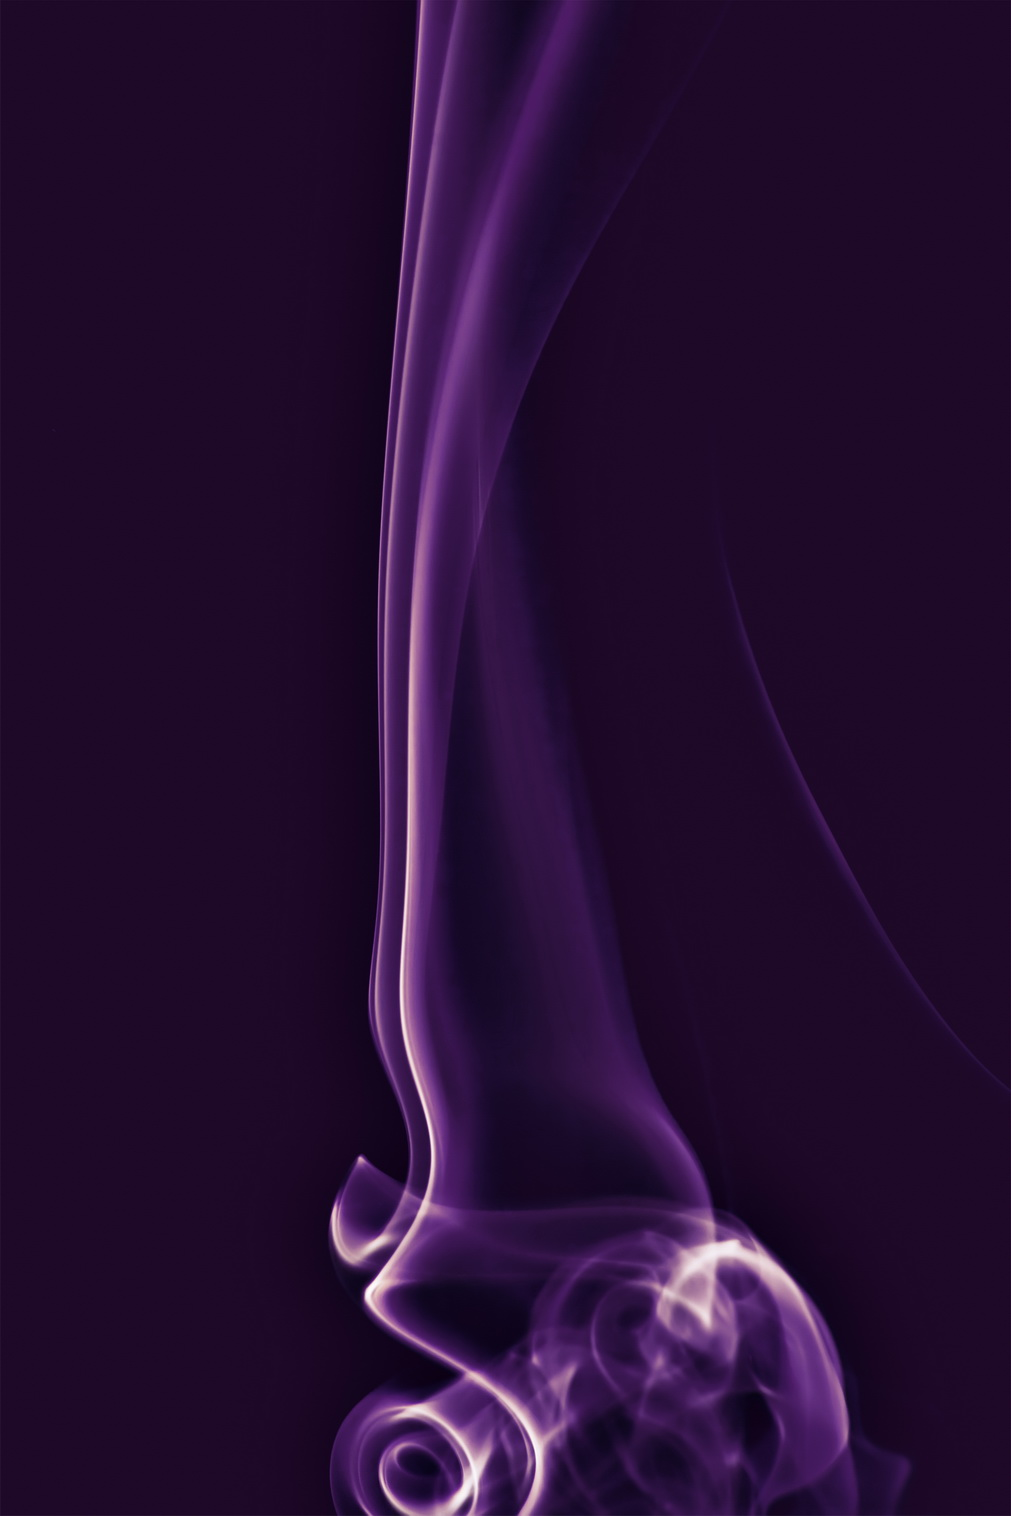 Purple smoke, Abstract, Black, Burn, Color, HQ Photo